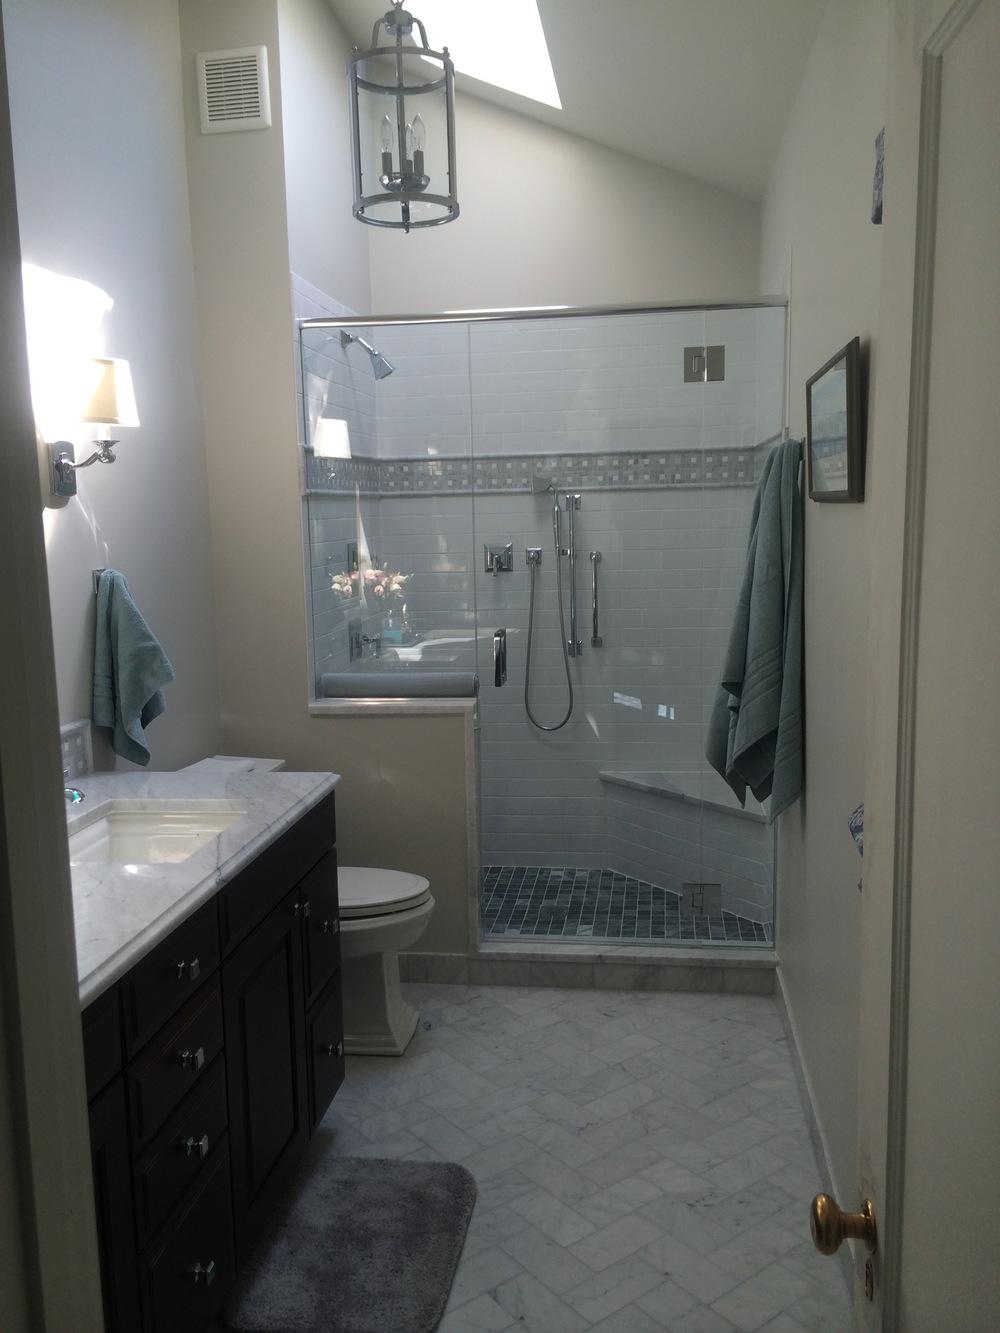 BathWashPark_1359.jpg